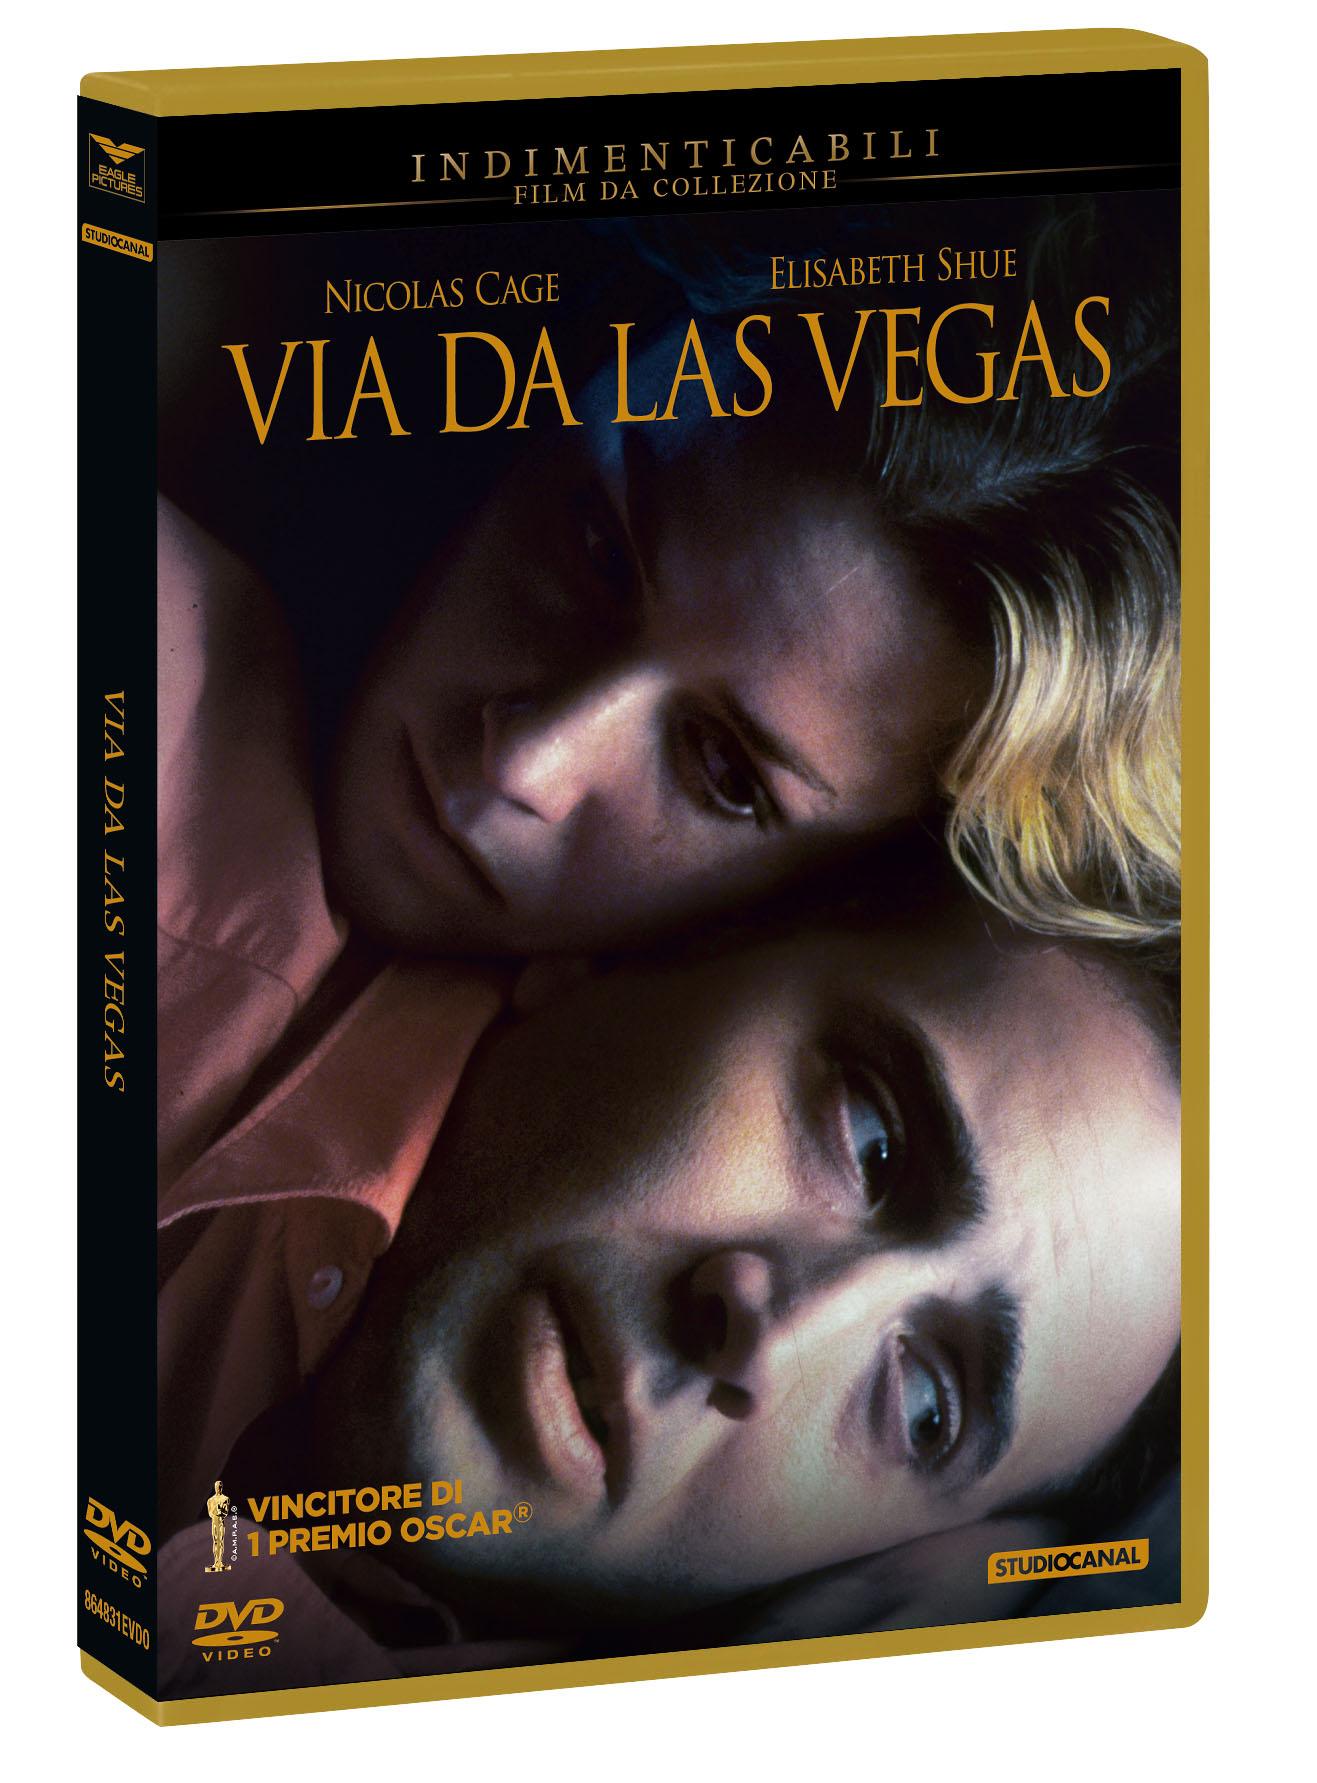 VIA DA LAS VEGAS (INDIMENTICABILI) (DVD)